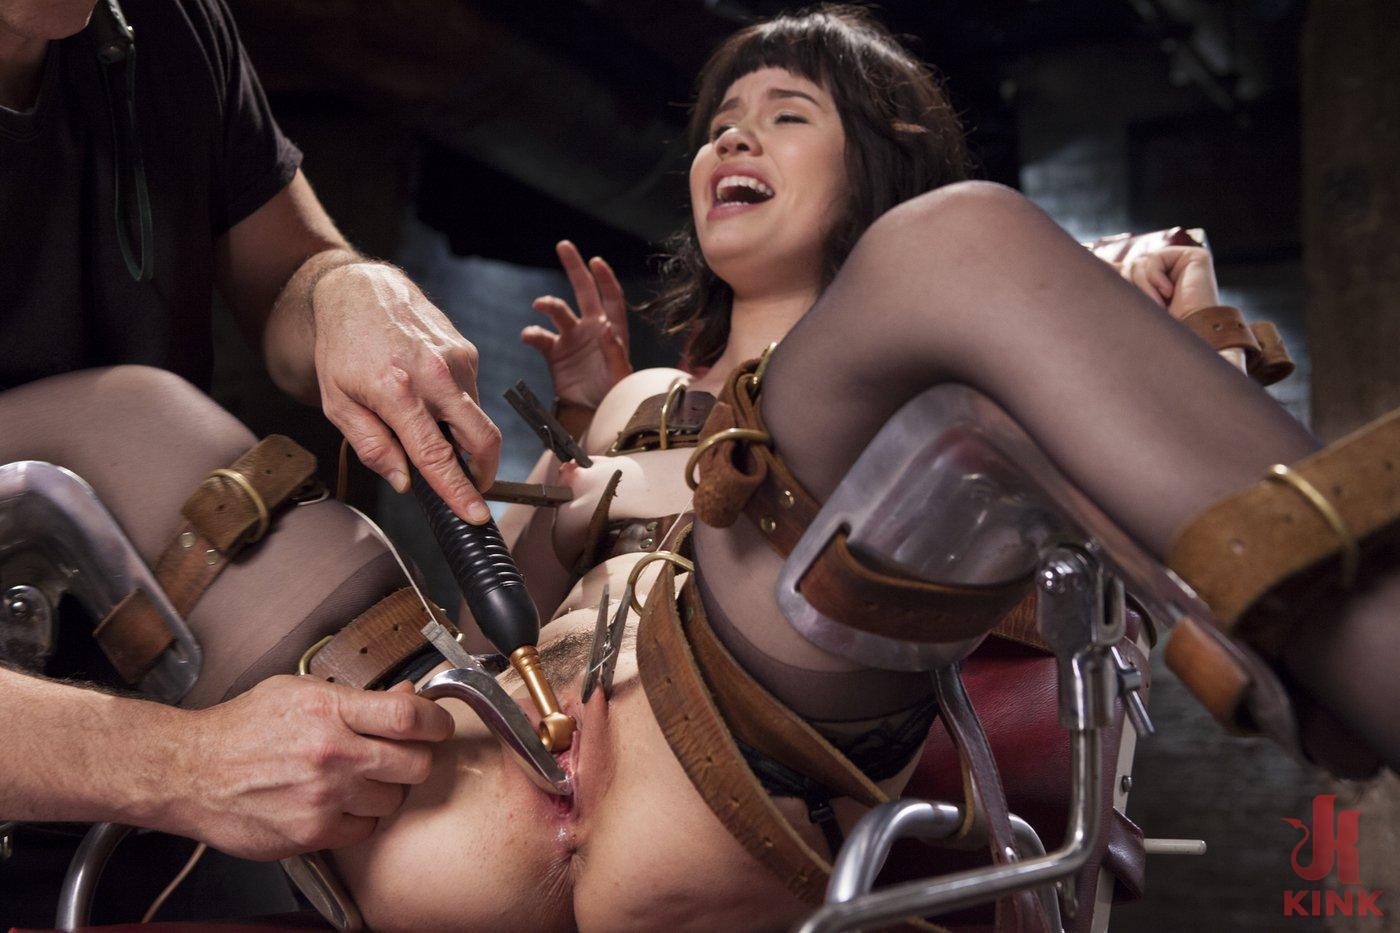 Amature wife tits nipples